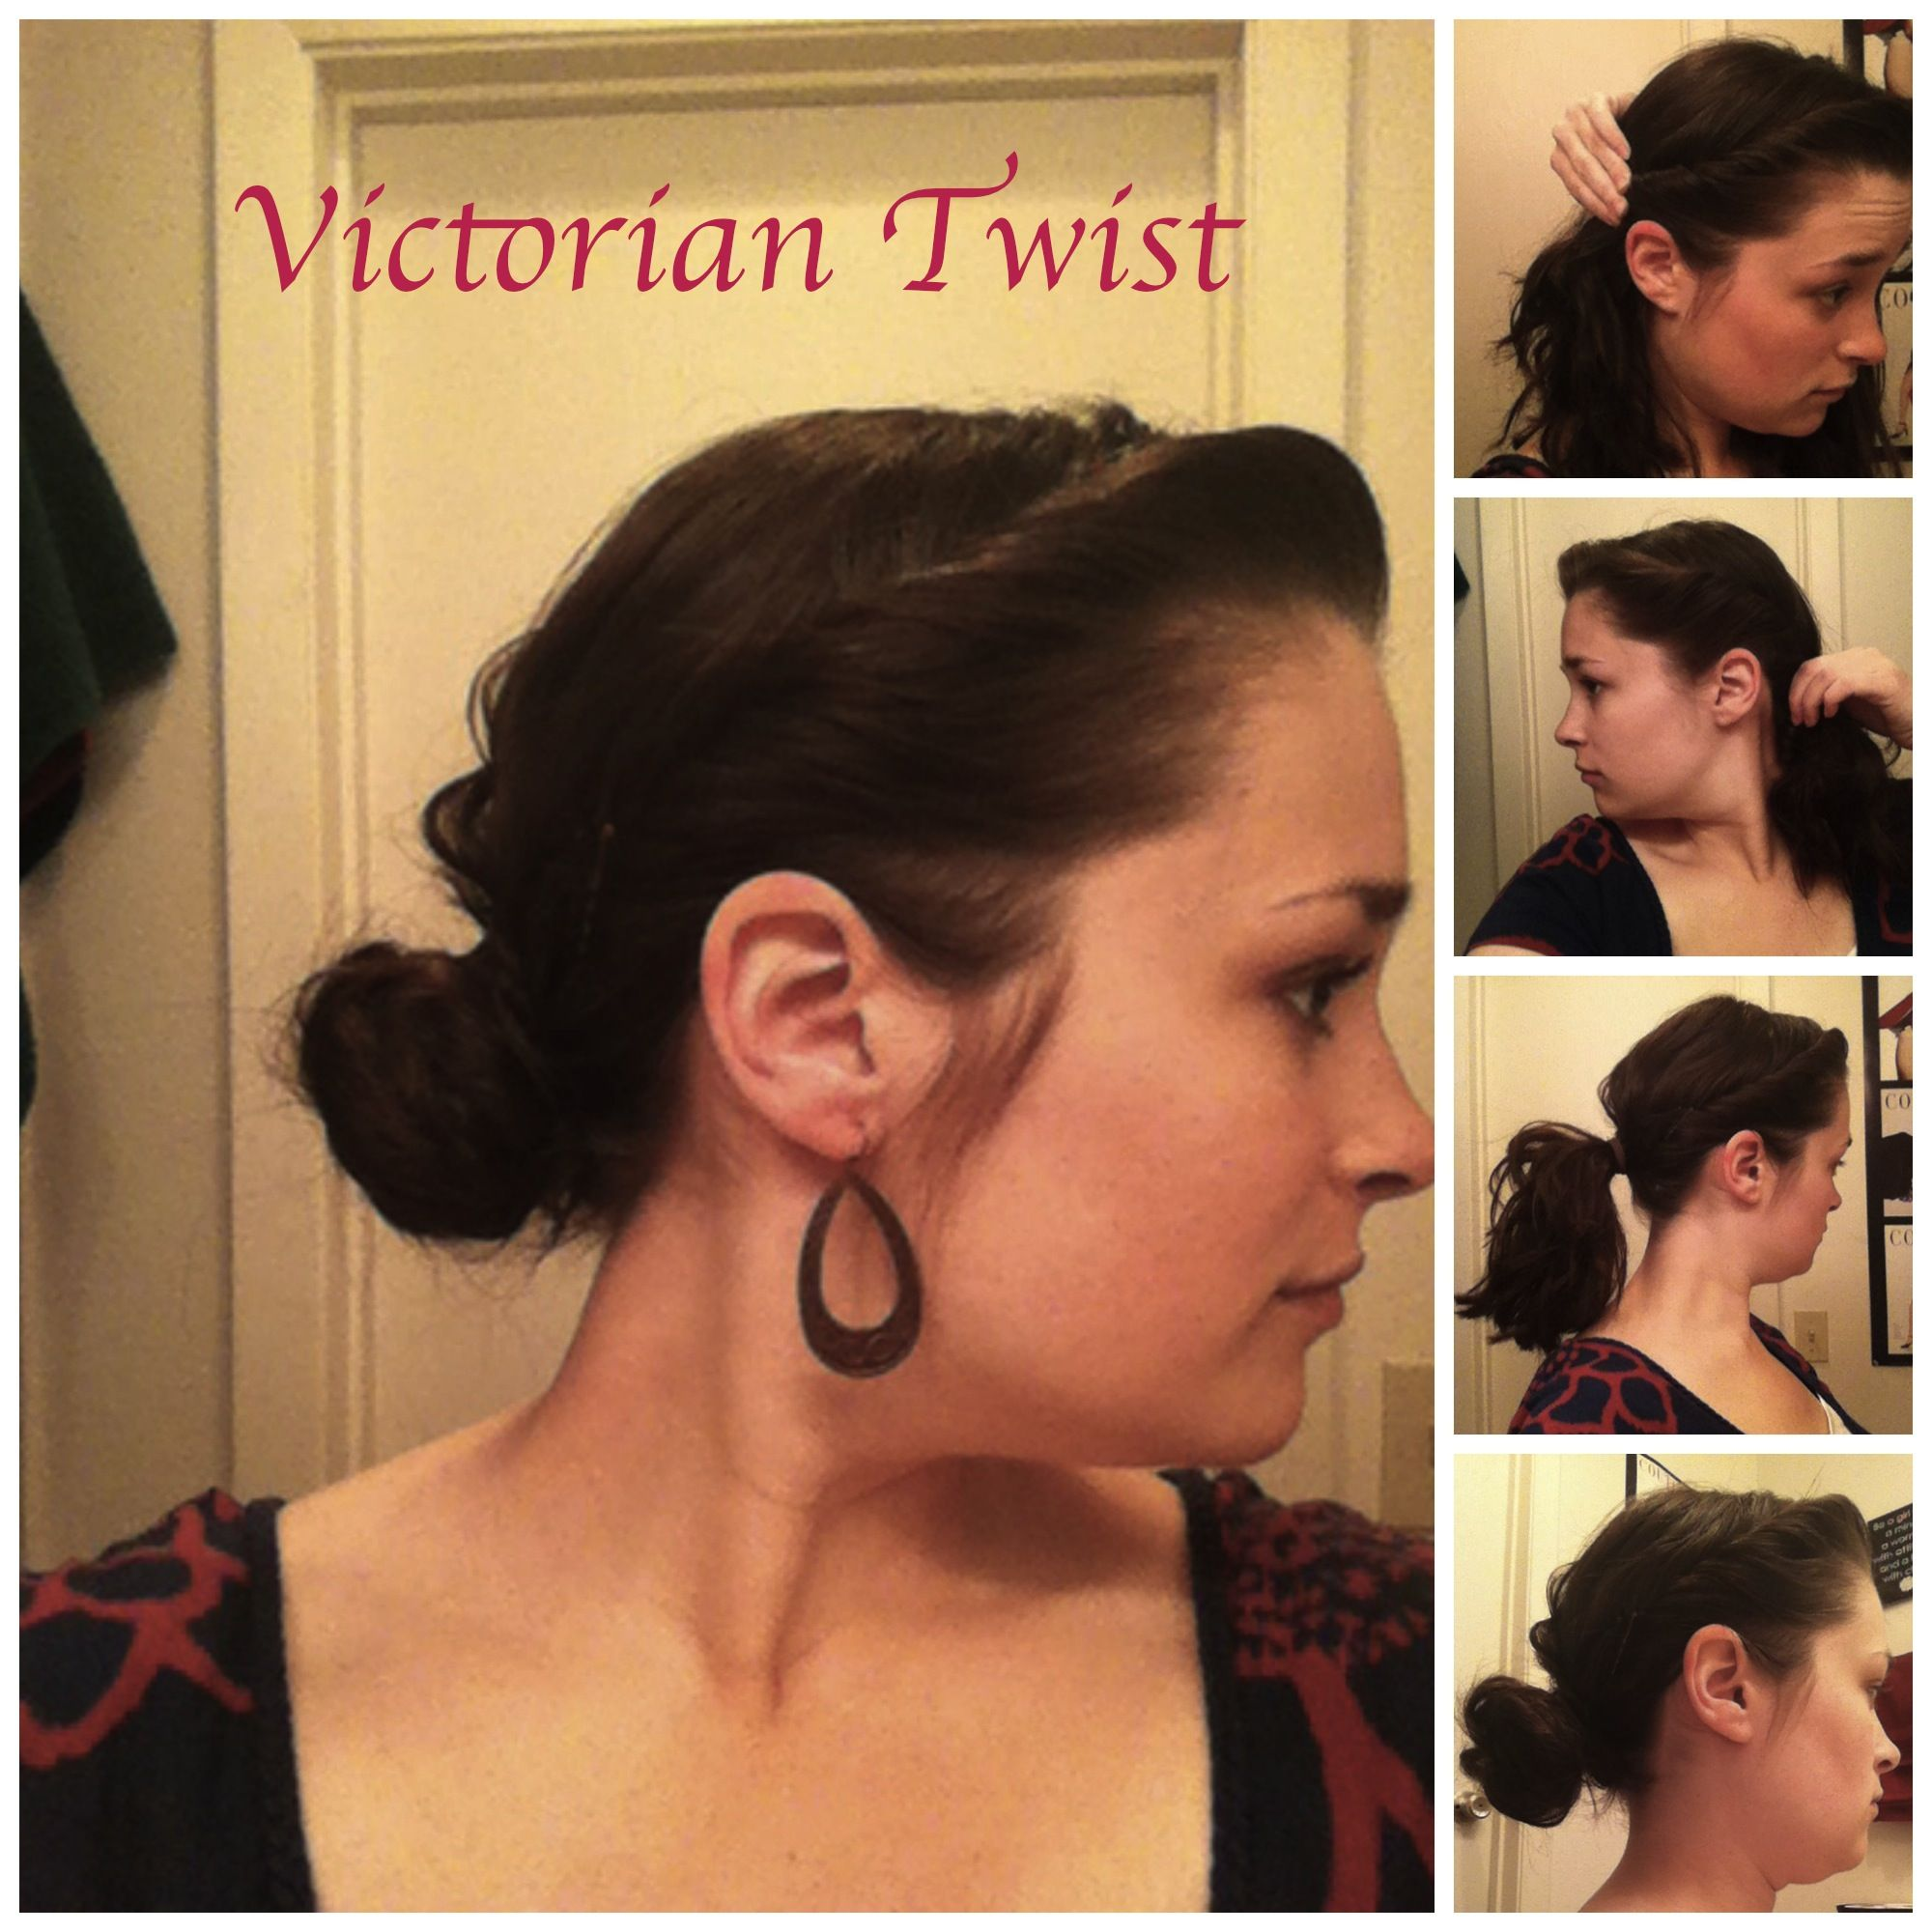 Easy hair-do: Victorian Twist | Victorian hairstyles, Hair styles, Hair tutorial